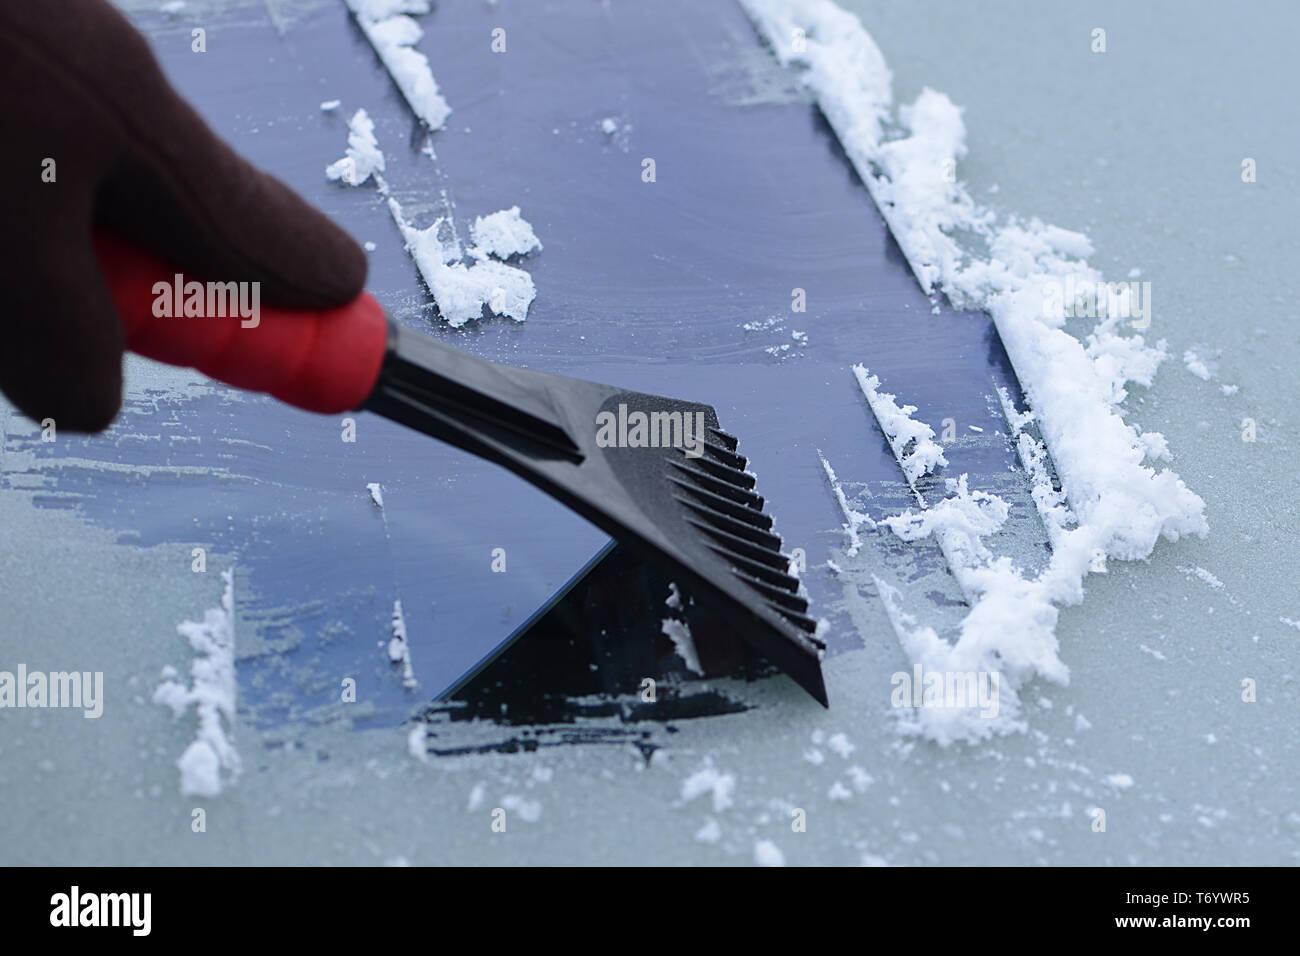 Ice scraper 8 - Stock Image